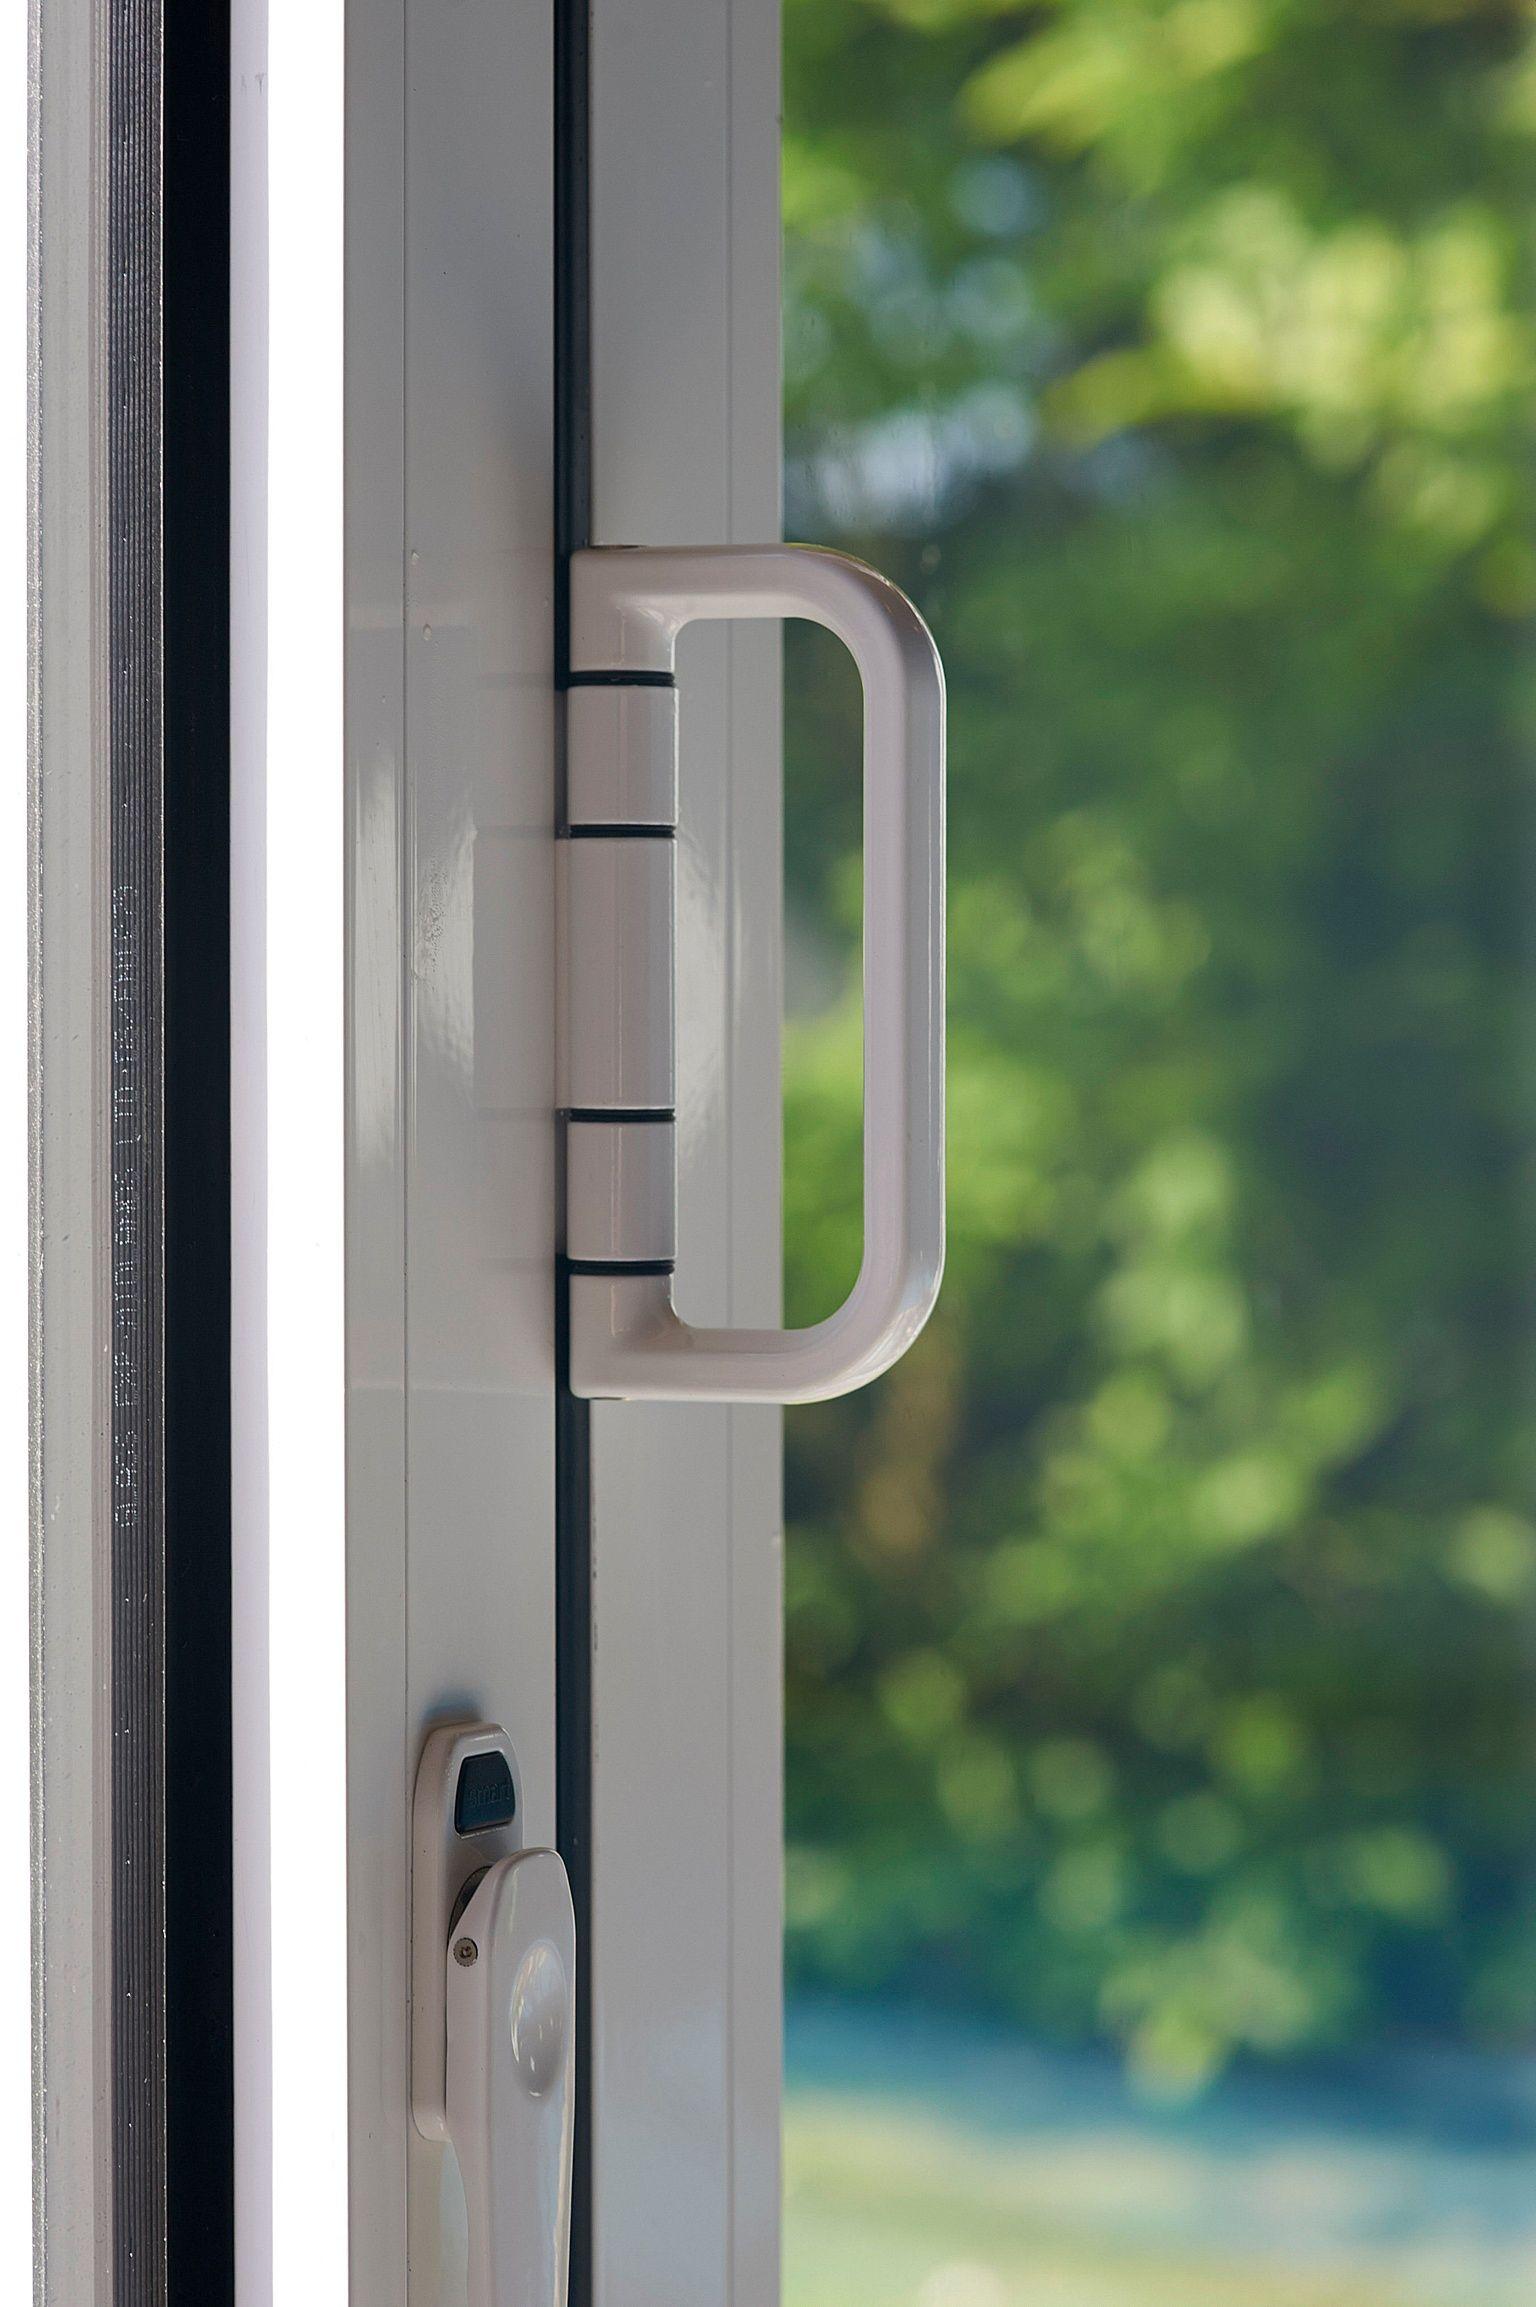 Best Idea By Heronhurst Window And Door Stu On Re Al Aluminium 400 x 300